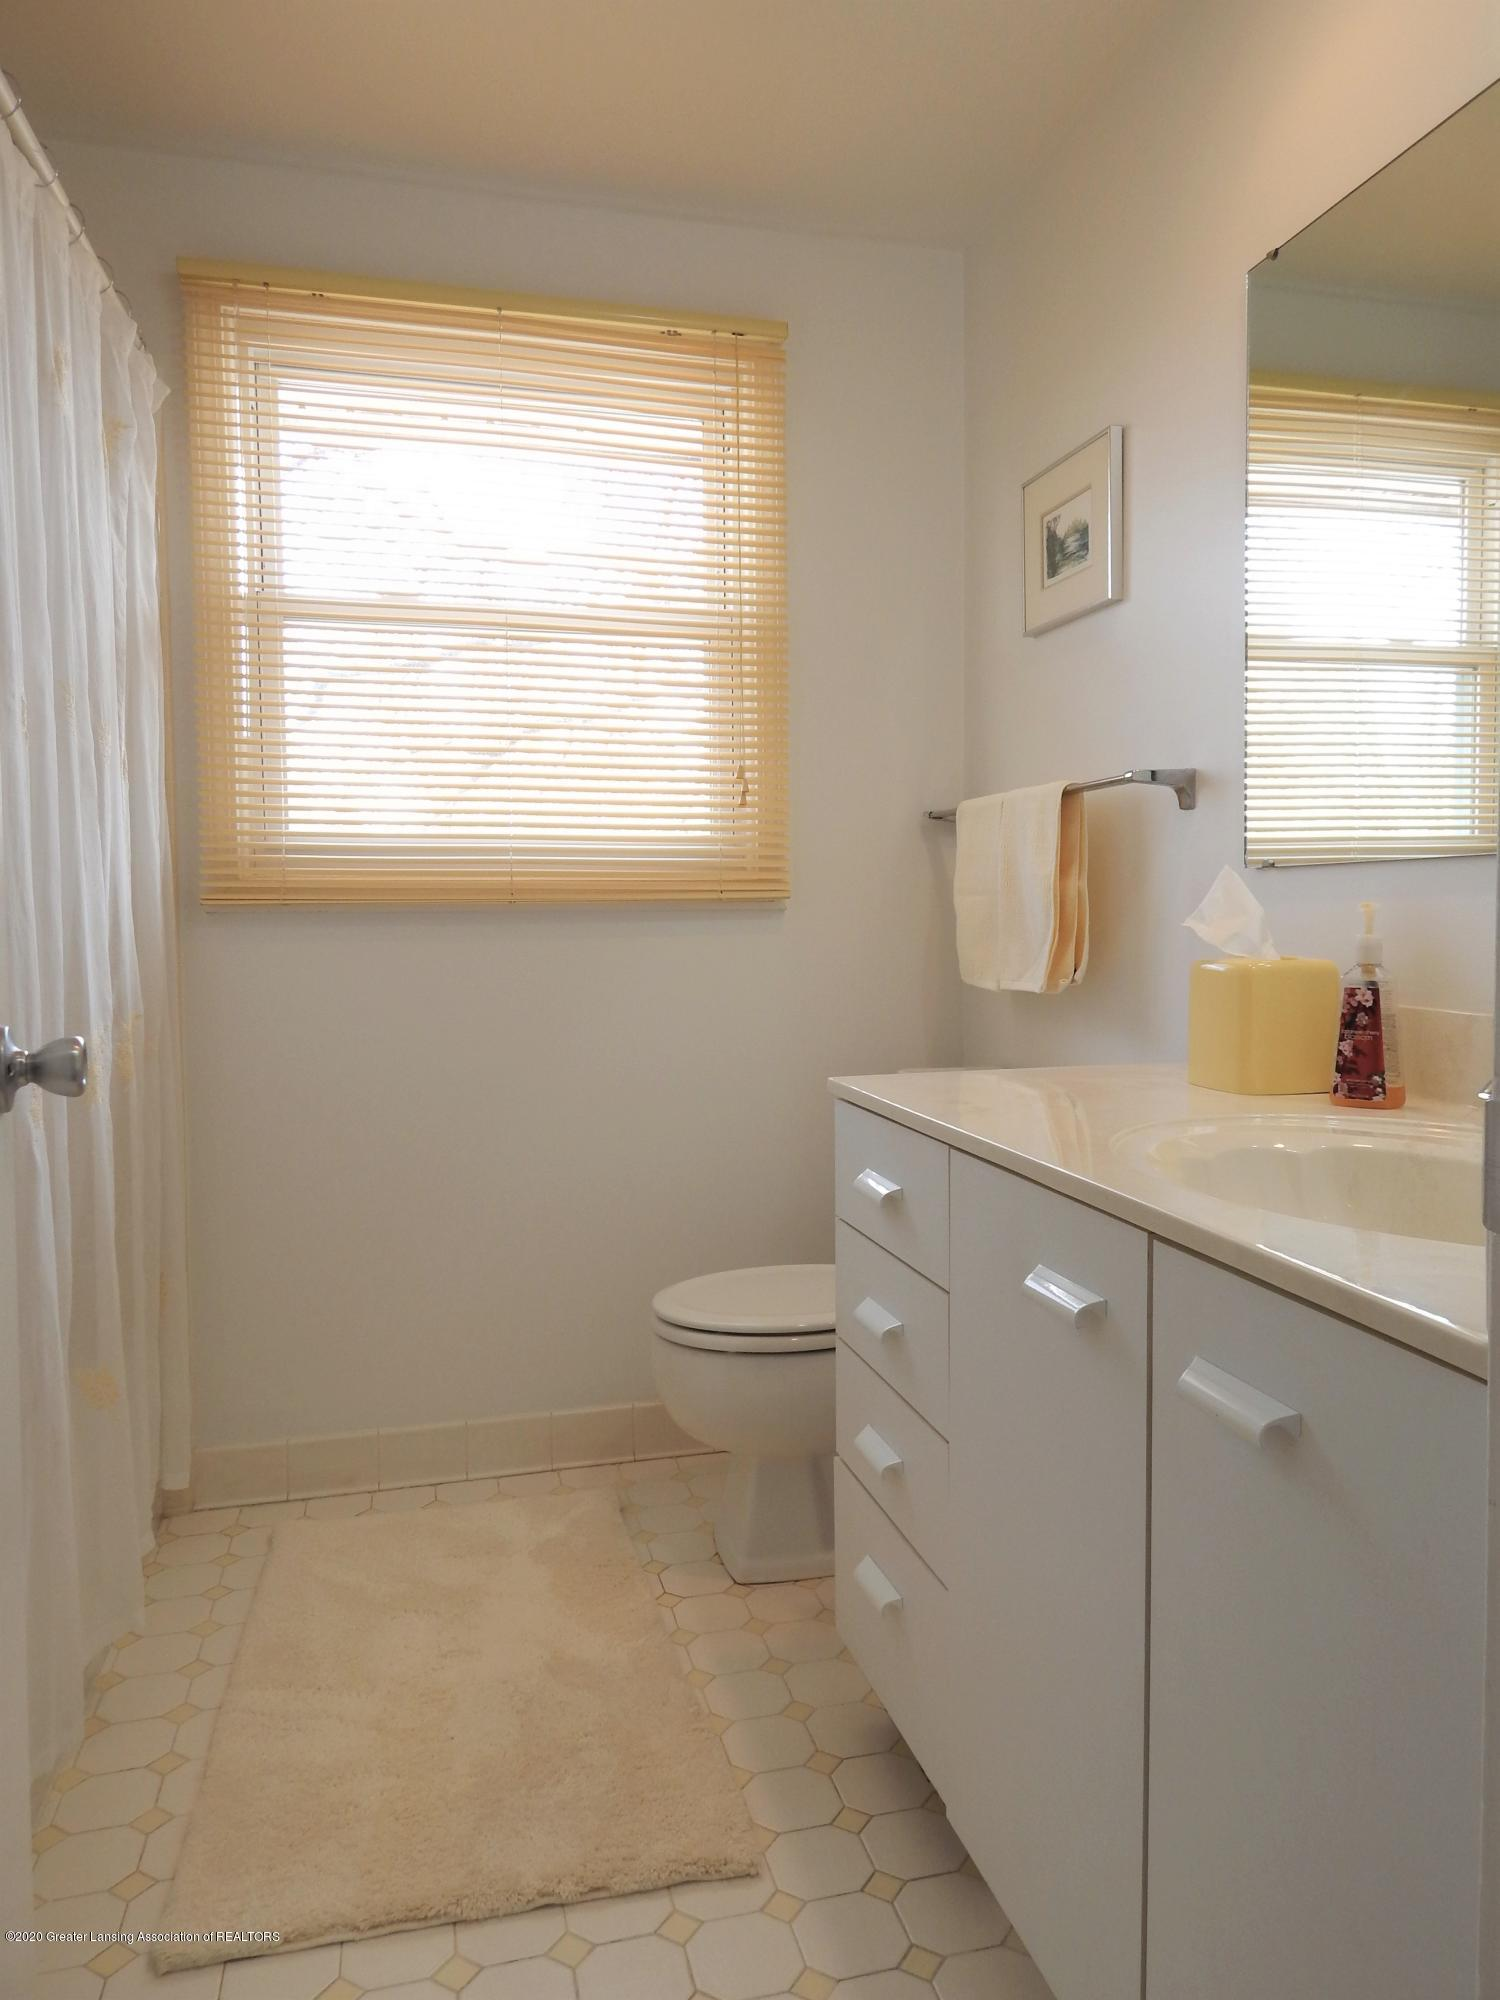 5435 Amber Dr - Bathroom - 26